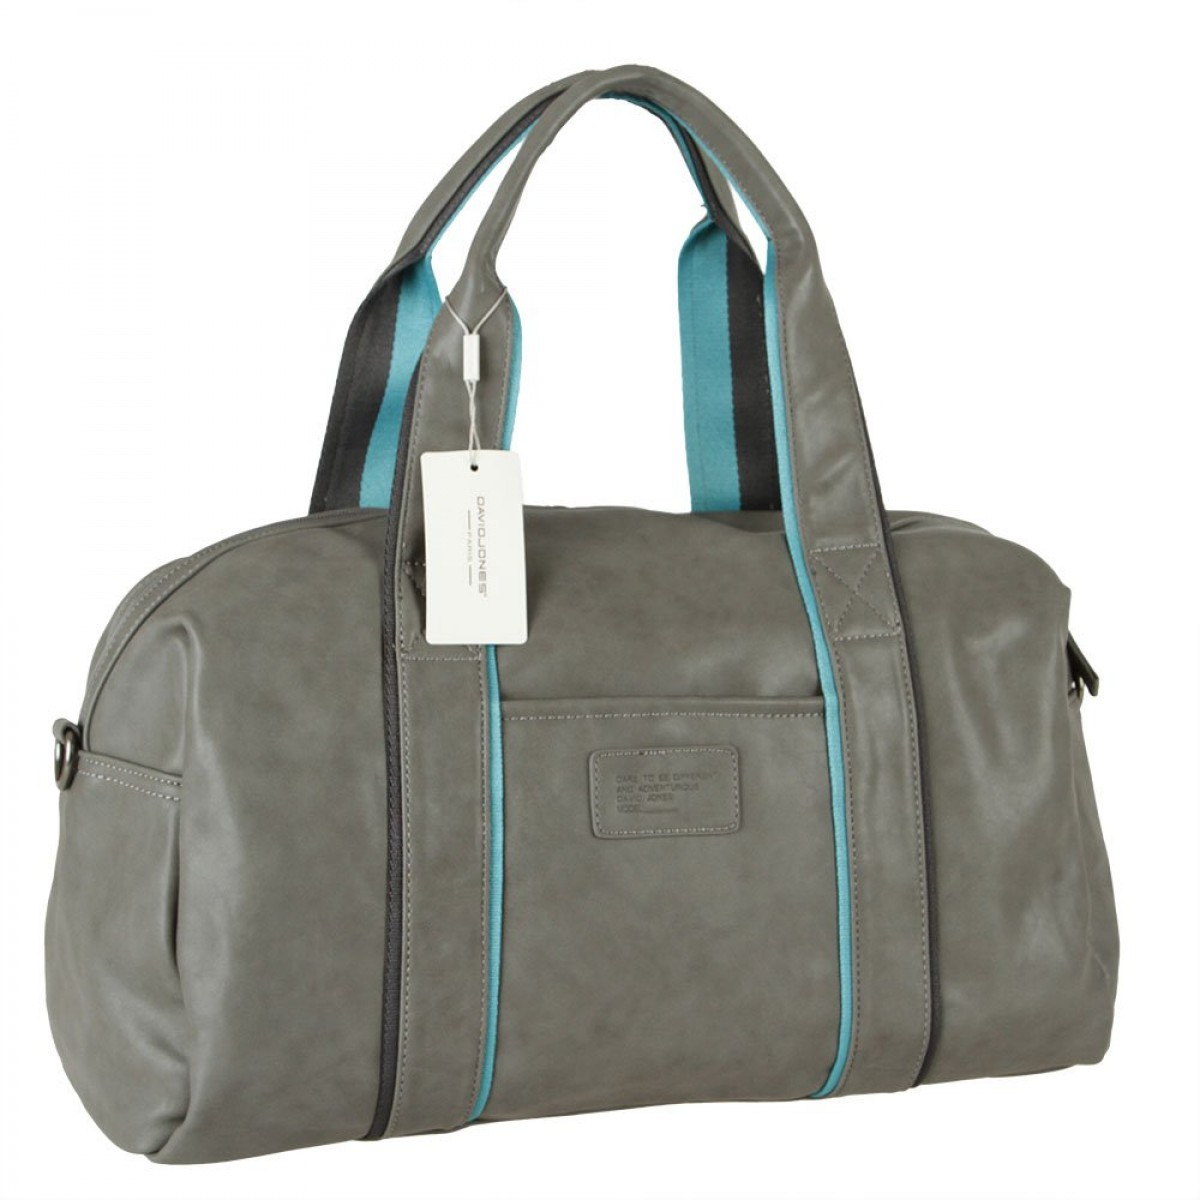 Жіноча сумка David Jones 5917-1 D.GREY